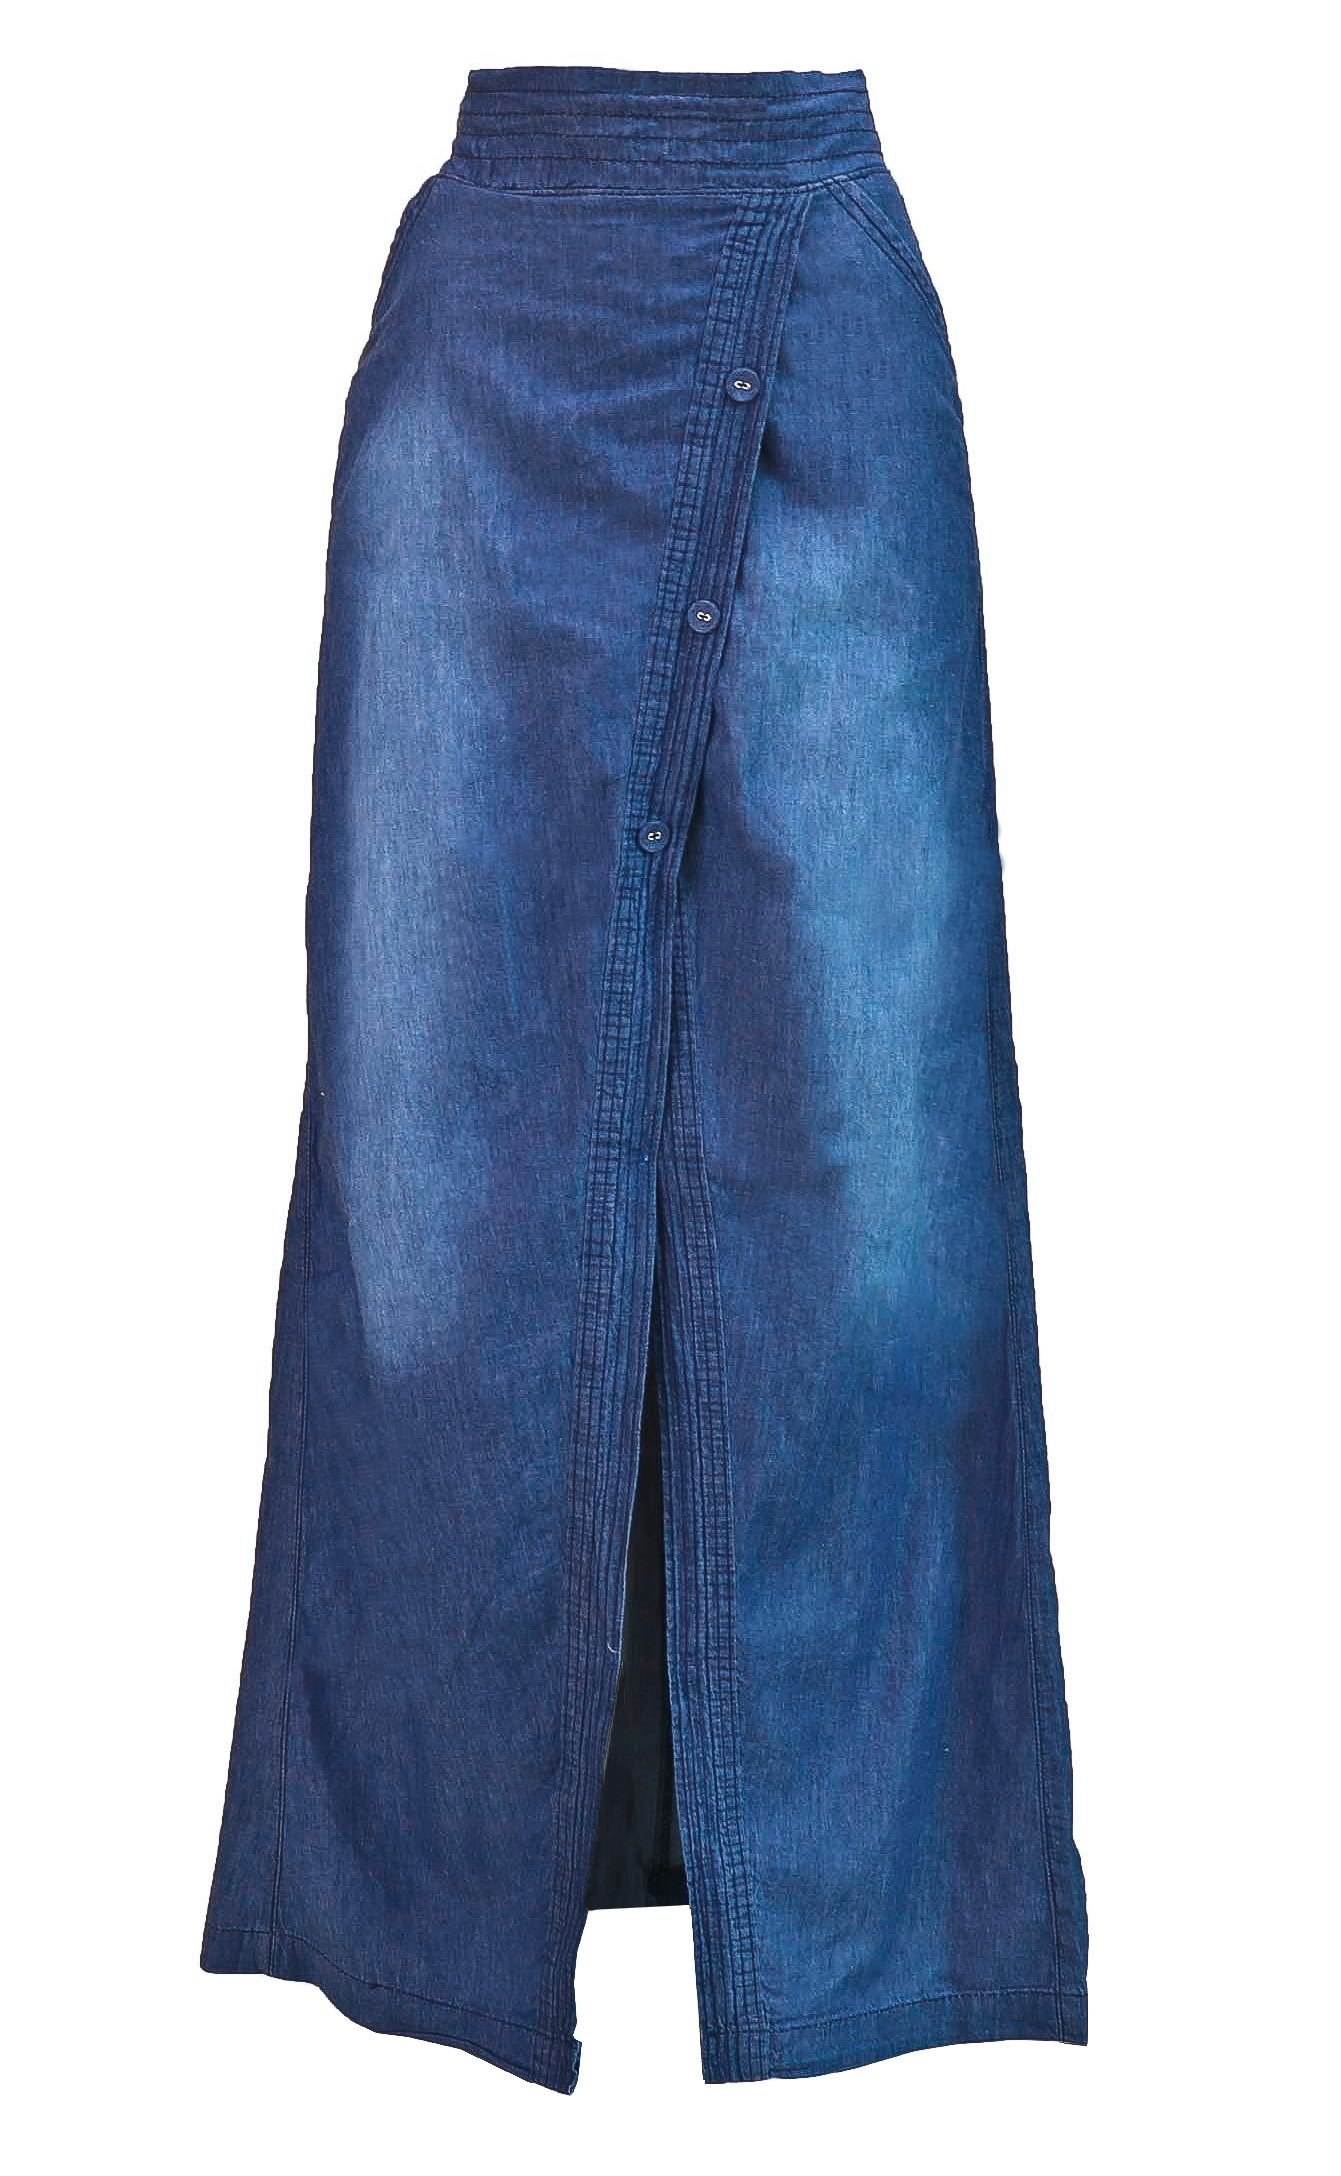 Fashion2Love Women's Juniors Long Light Denim Slit Maxi Skirt in Washed Blue Size M